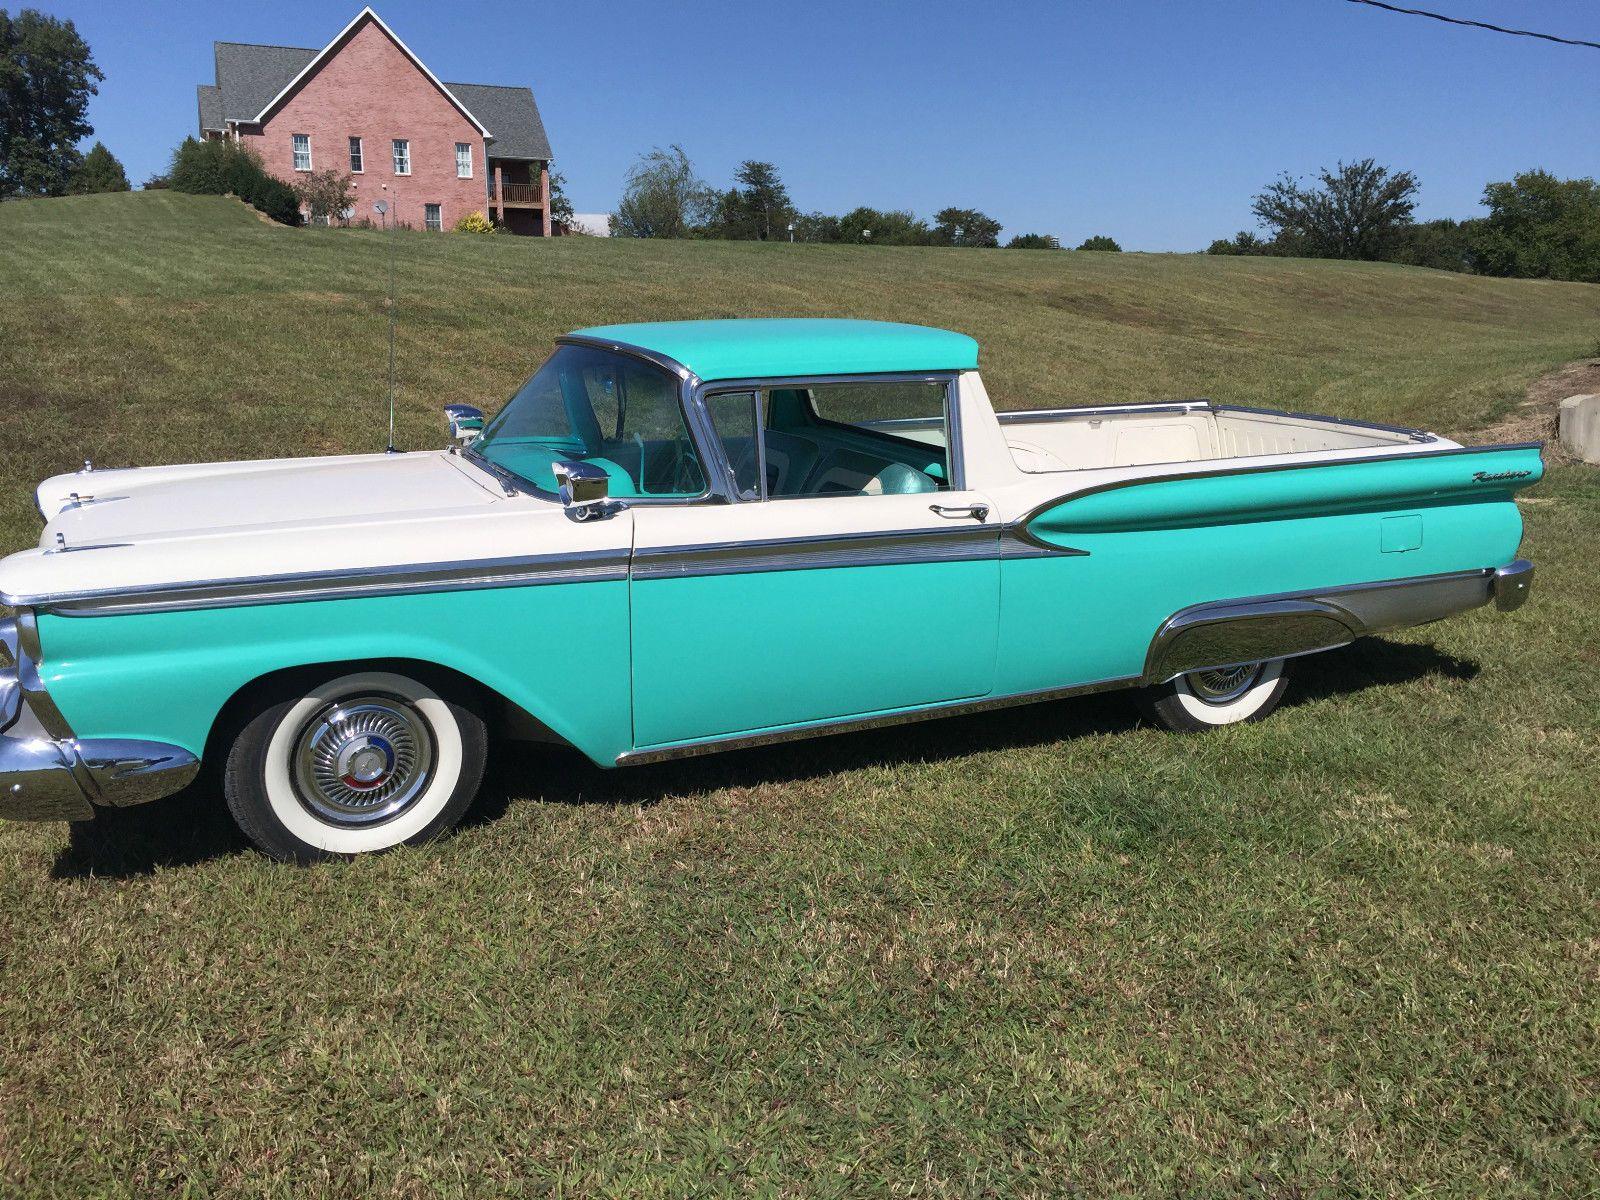 1959 ford ranchero custom for sale jackson missouri united states